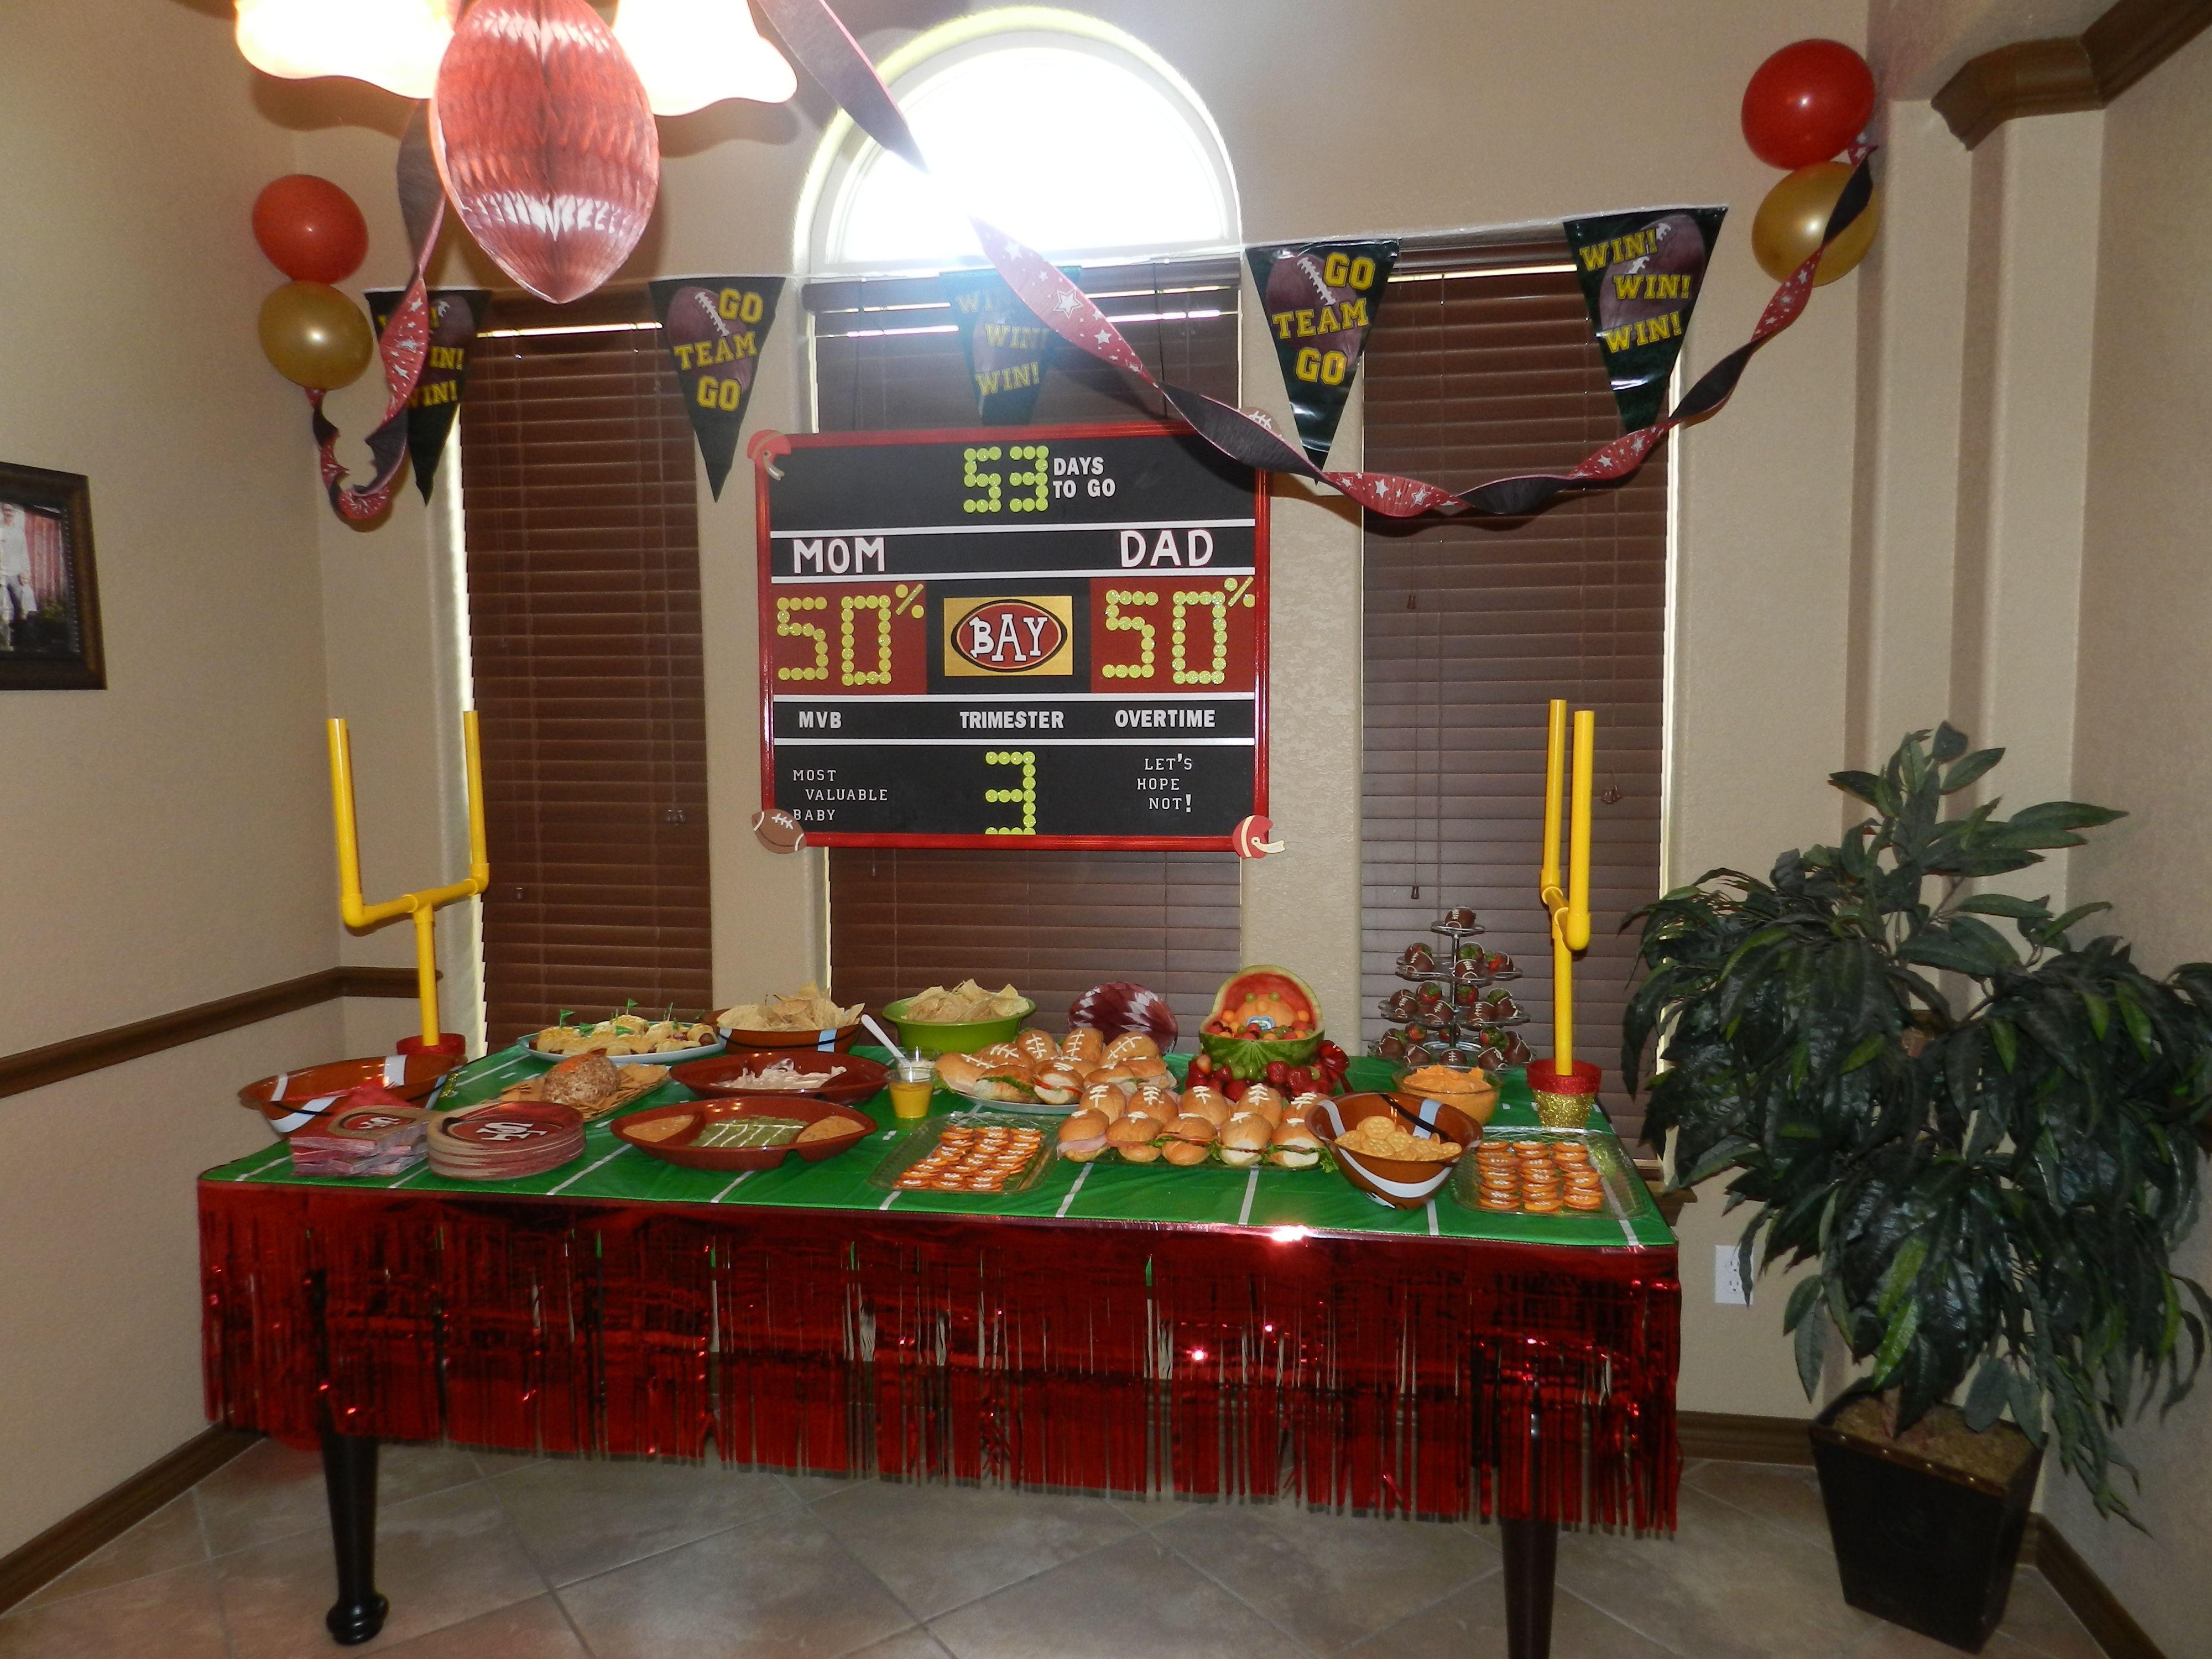 49ers Baby Shower. LOVE The Scoreboard!